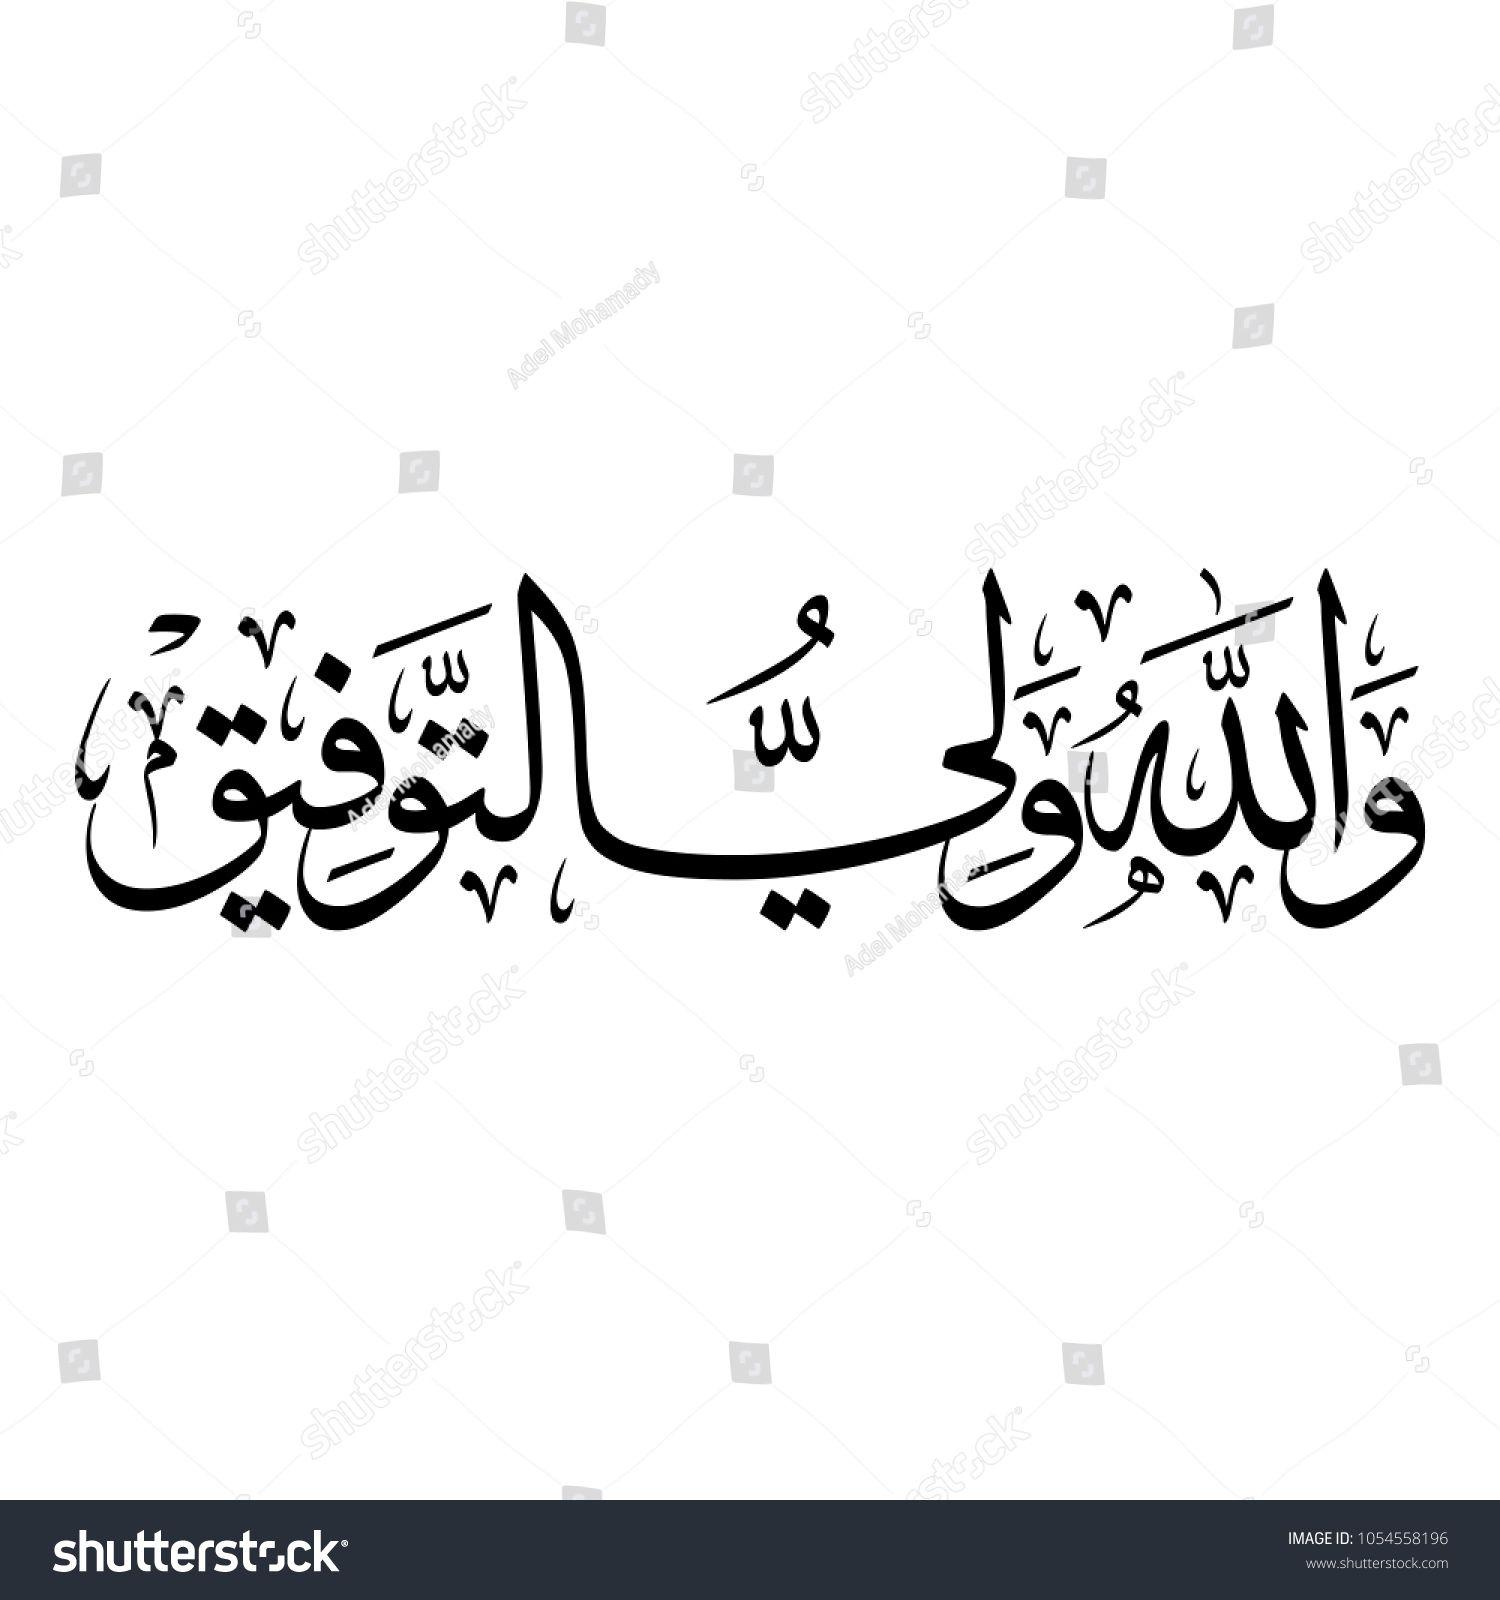 والله ولي التوفيق Calligraphy Arabic Calligraphy Allah